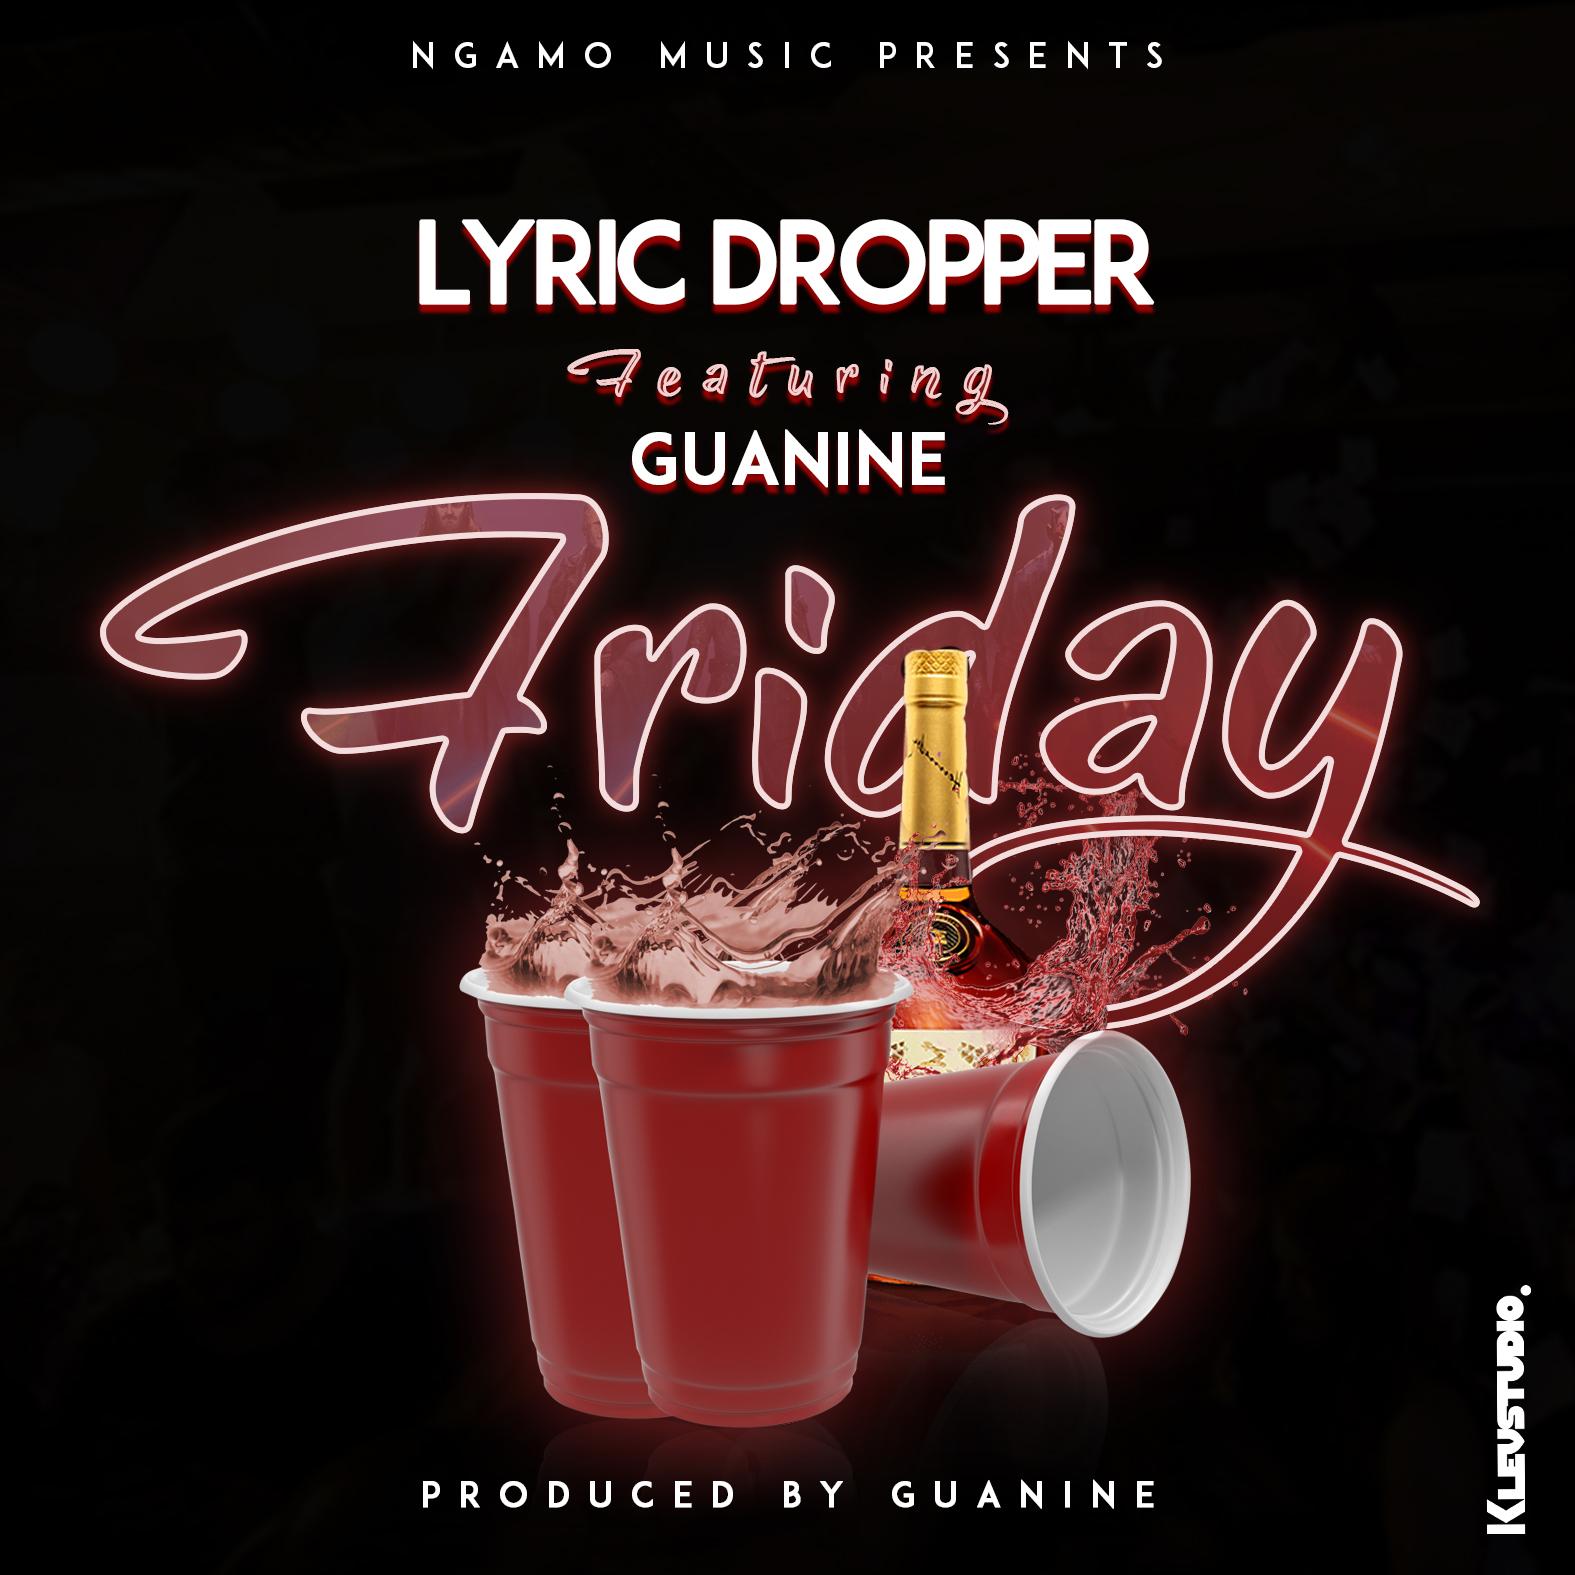 Lyrics-Dropper-Friday-Ft-Guanine-Prod-by-Guanine